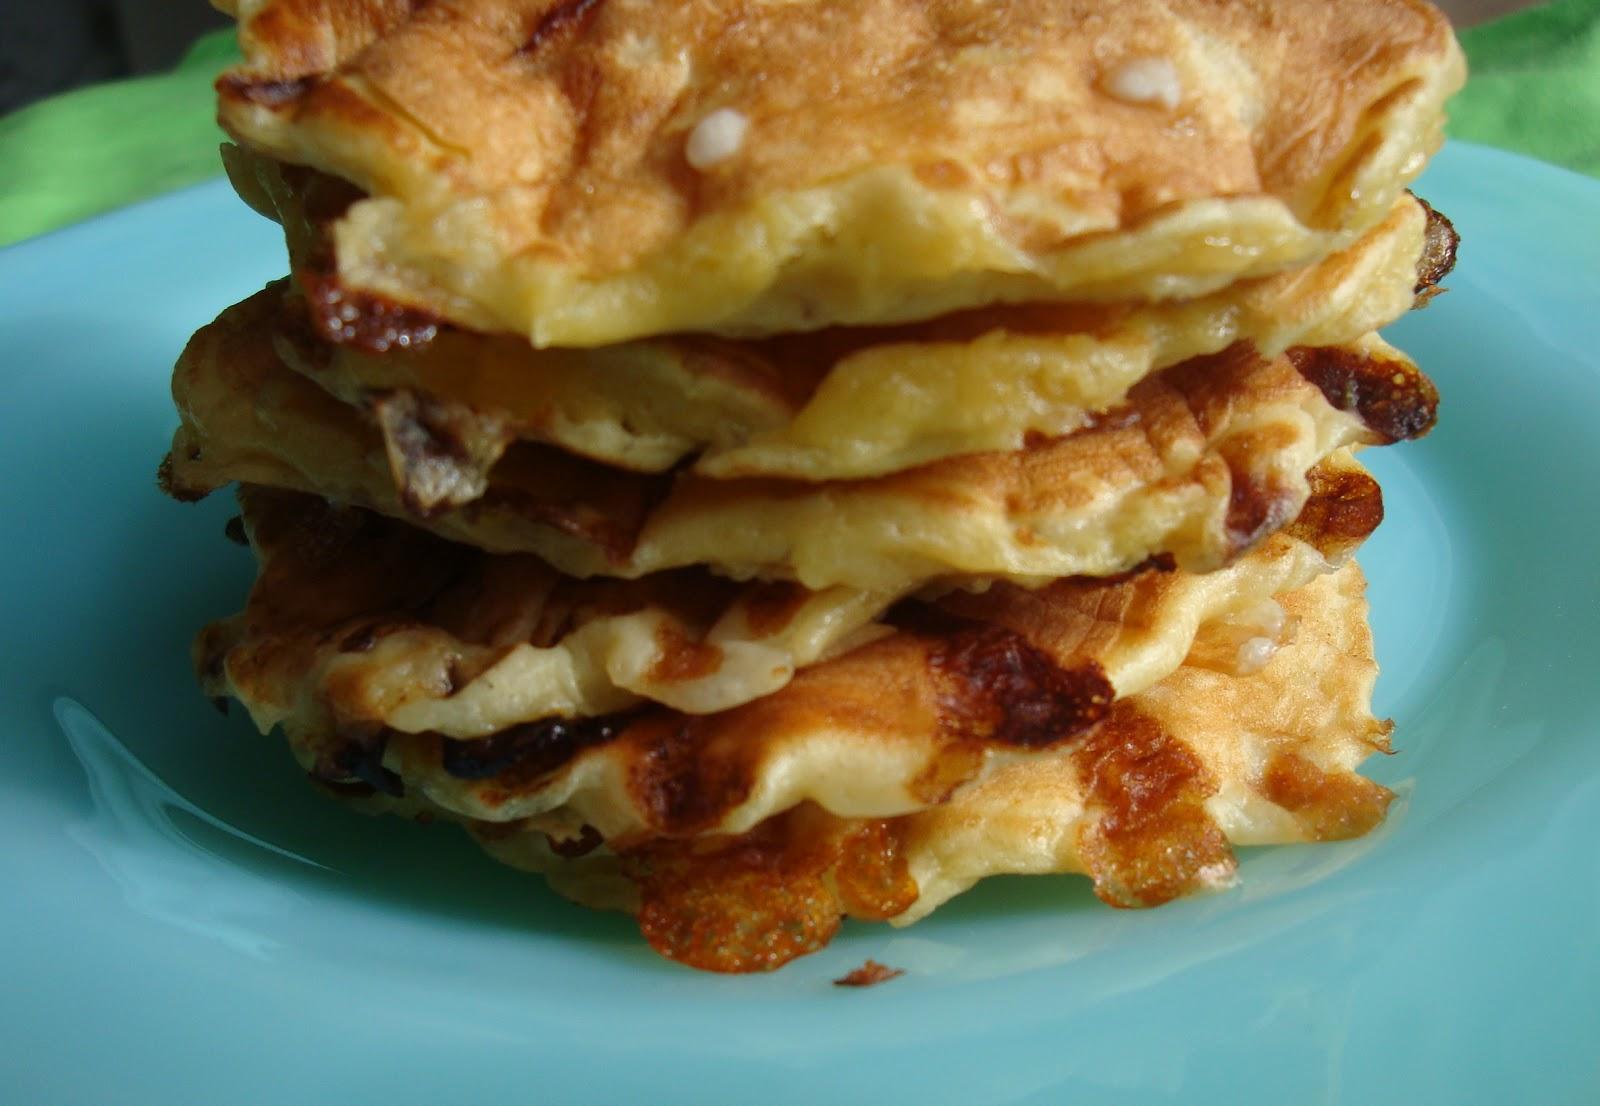 Miraculous Chipotle Macaroni And Cheese Interior Design Ideas Clesiryabchikinfo